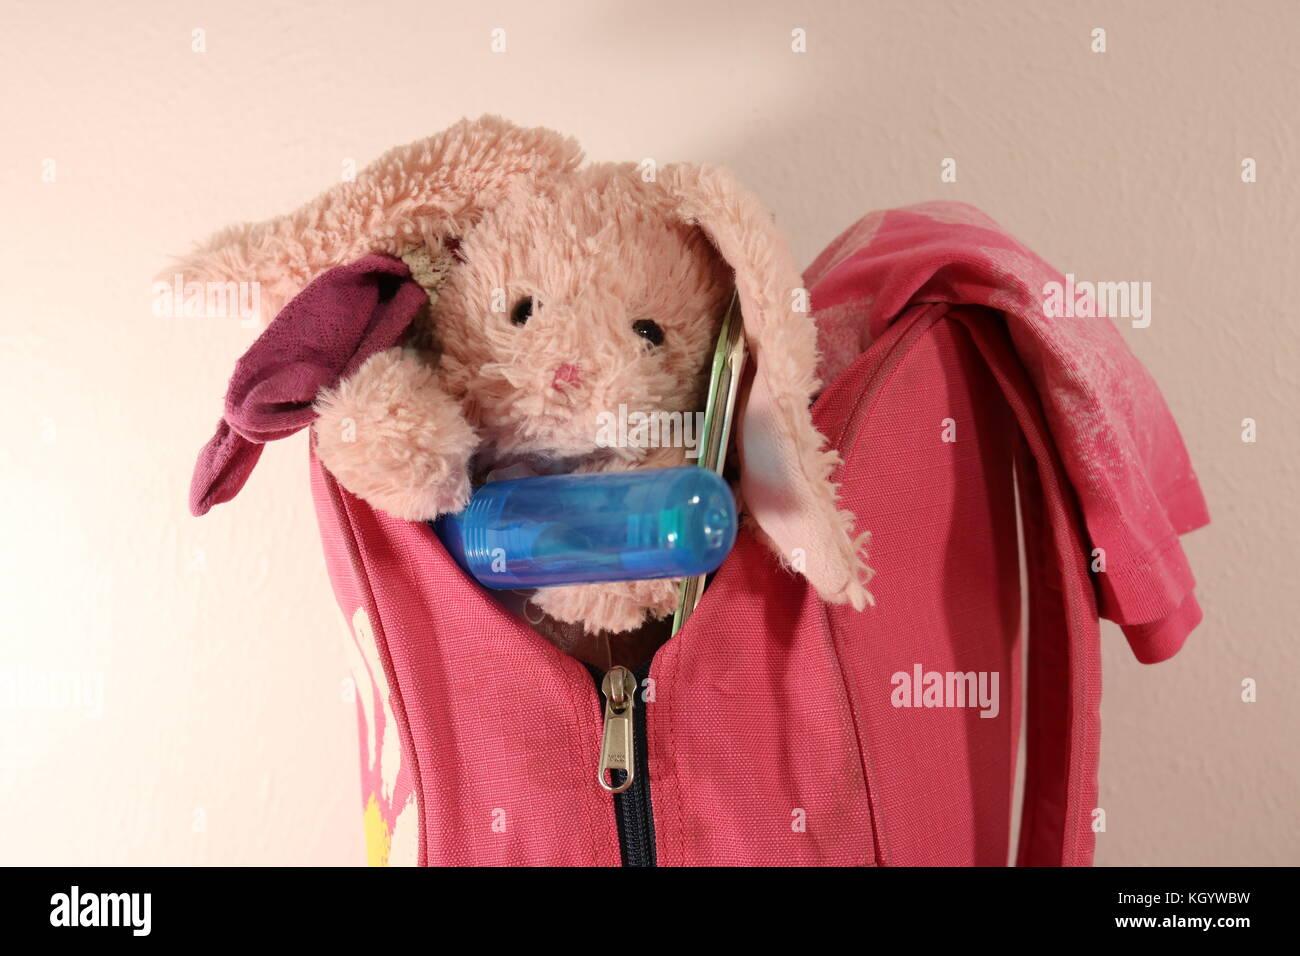 Packed girl's bag ready for sleepover - Stock Image